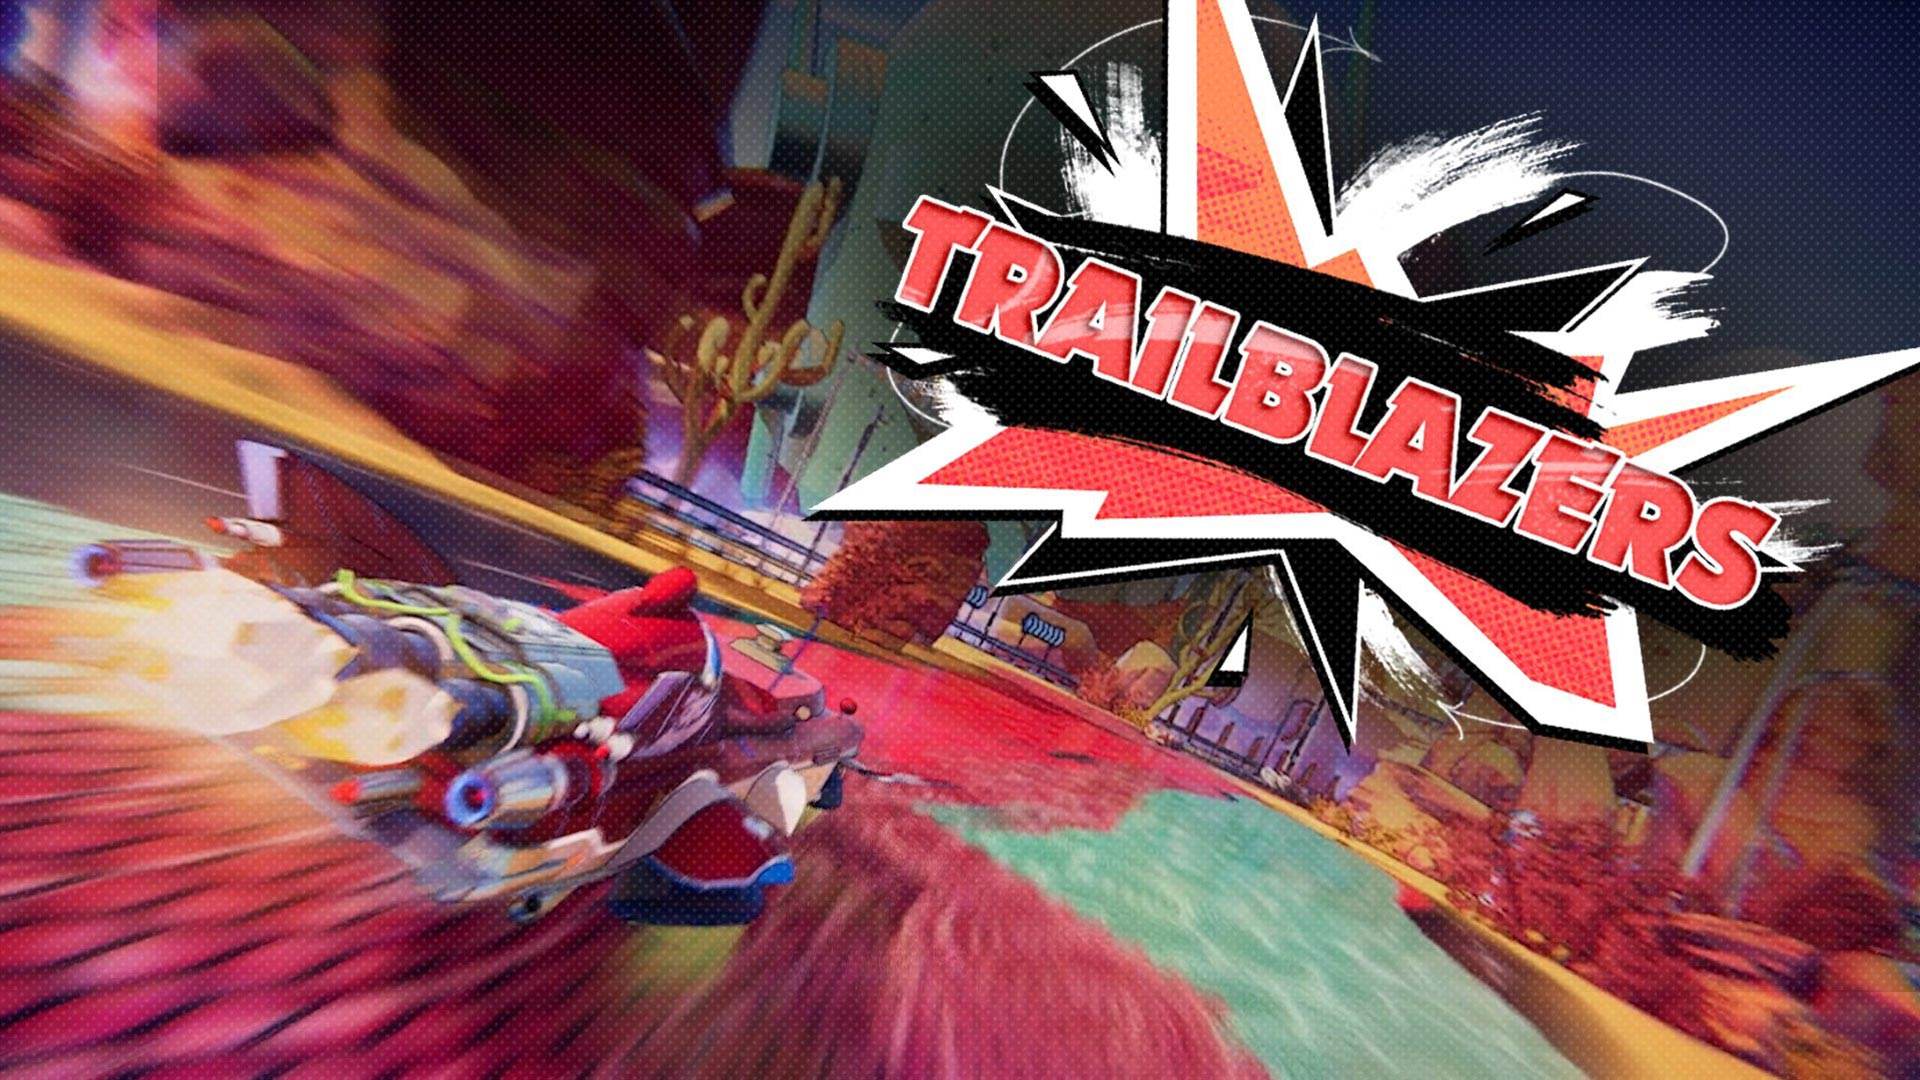 Trailblazers PS4 vrplayer.fr